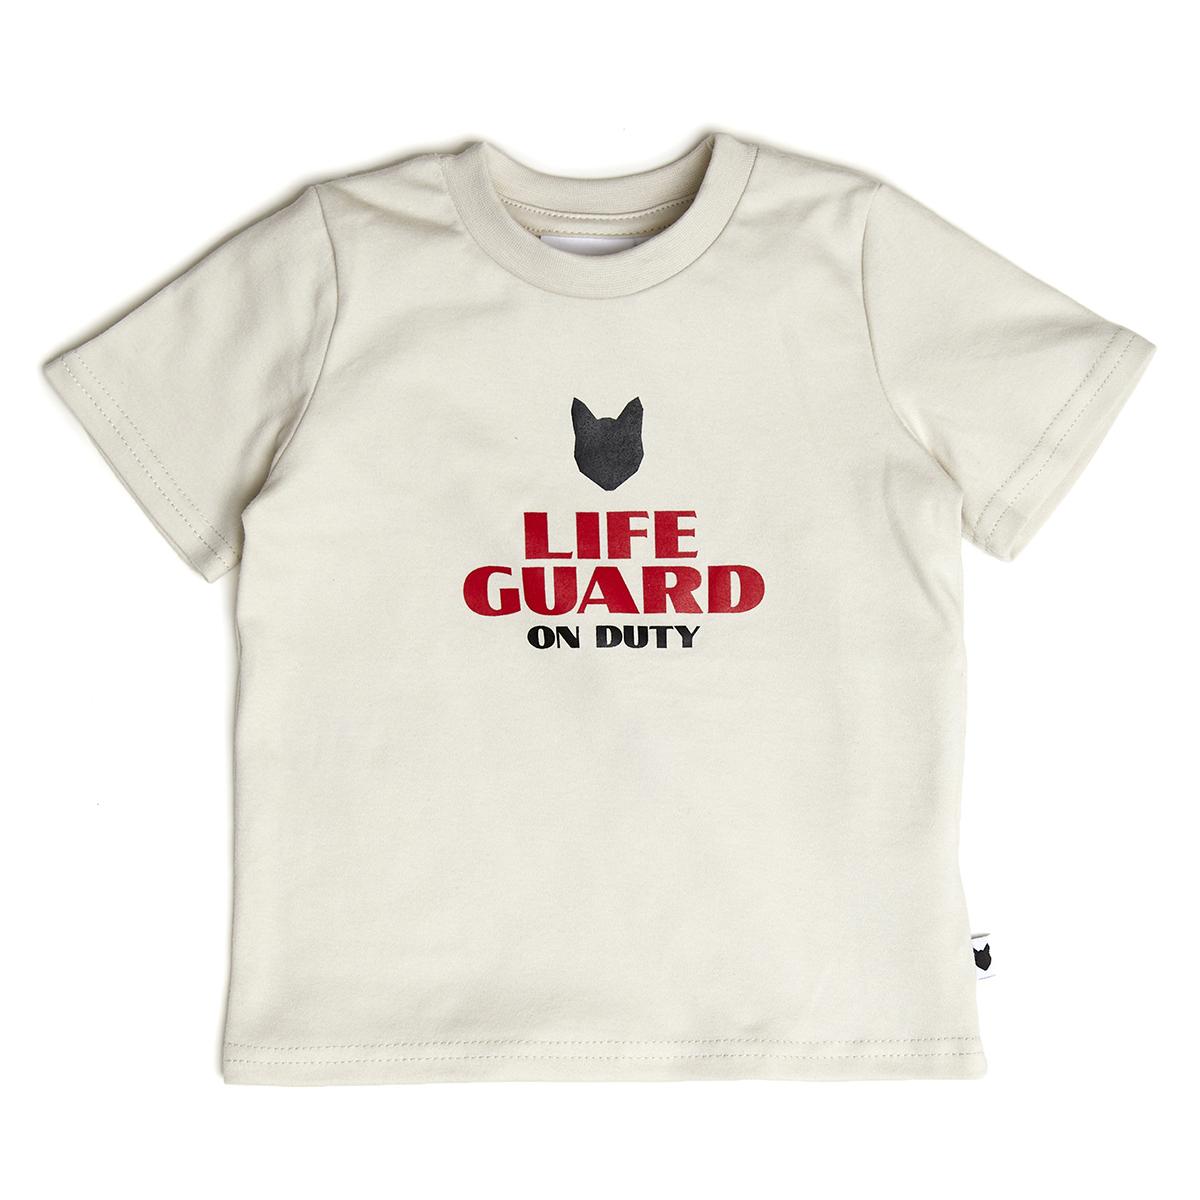 Hauts bébé Tee-Shirt Lifeguard - 12/18 Mois